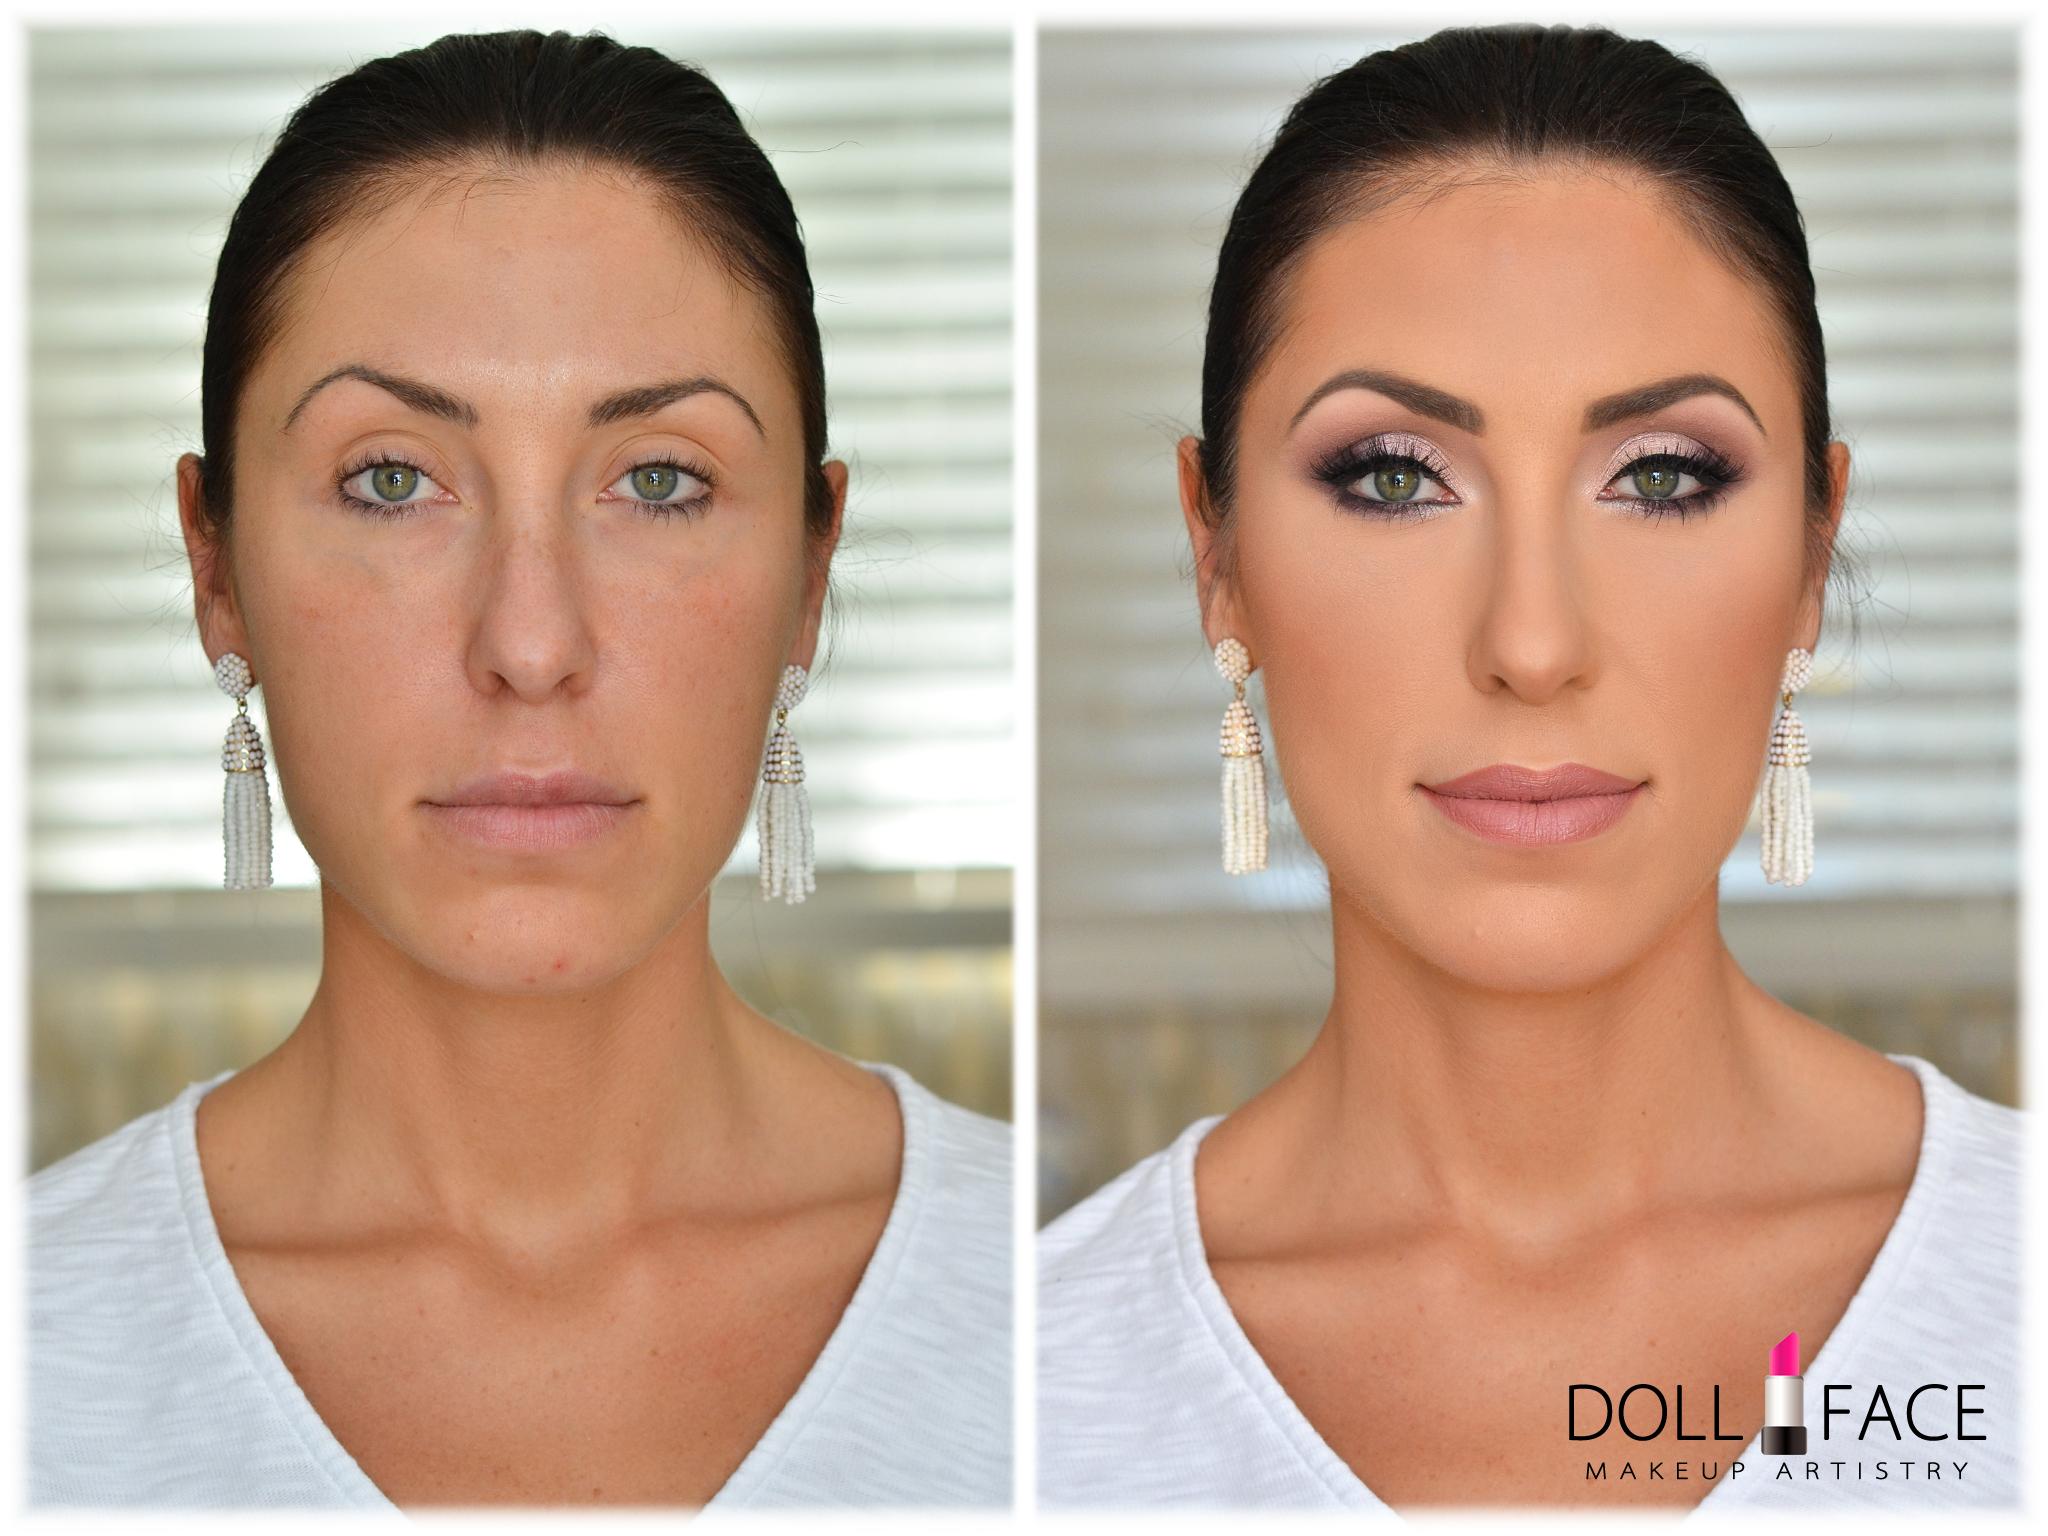 doll face makeup artistry nj